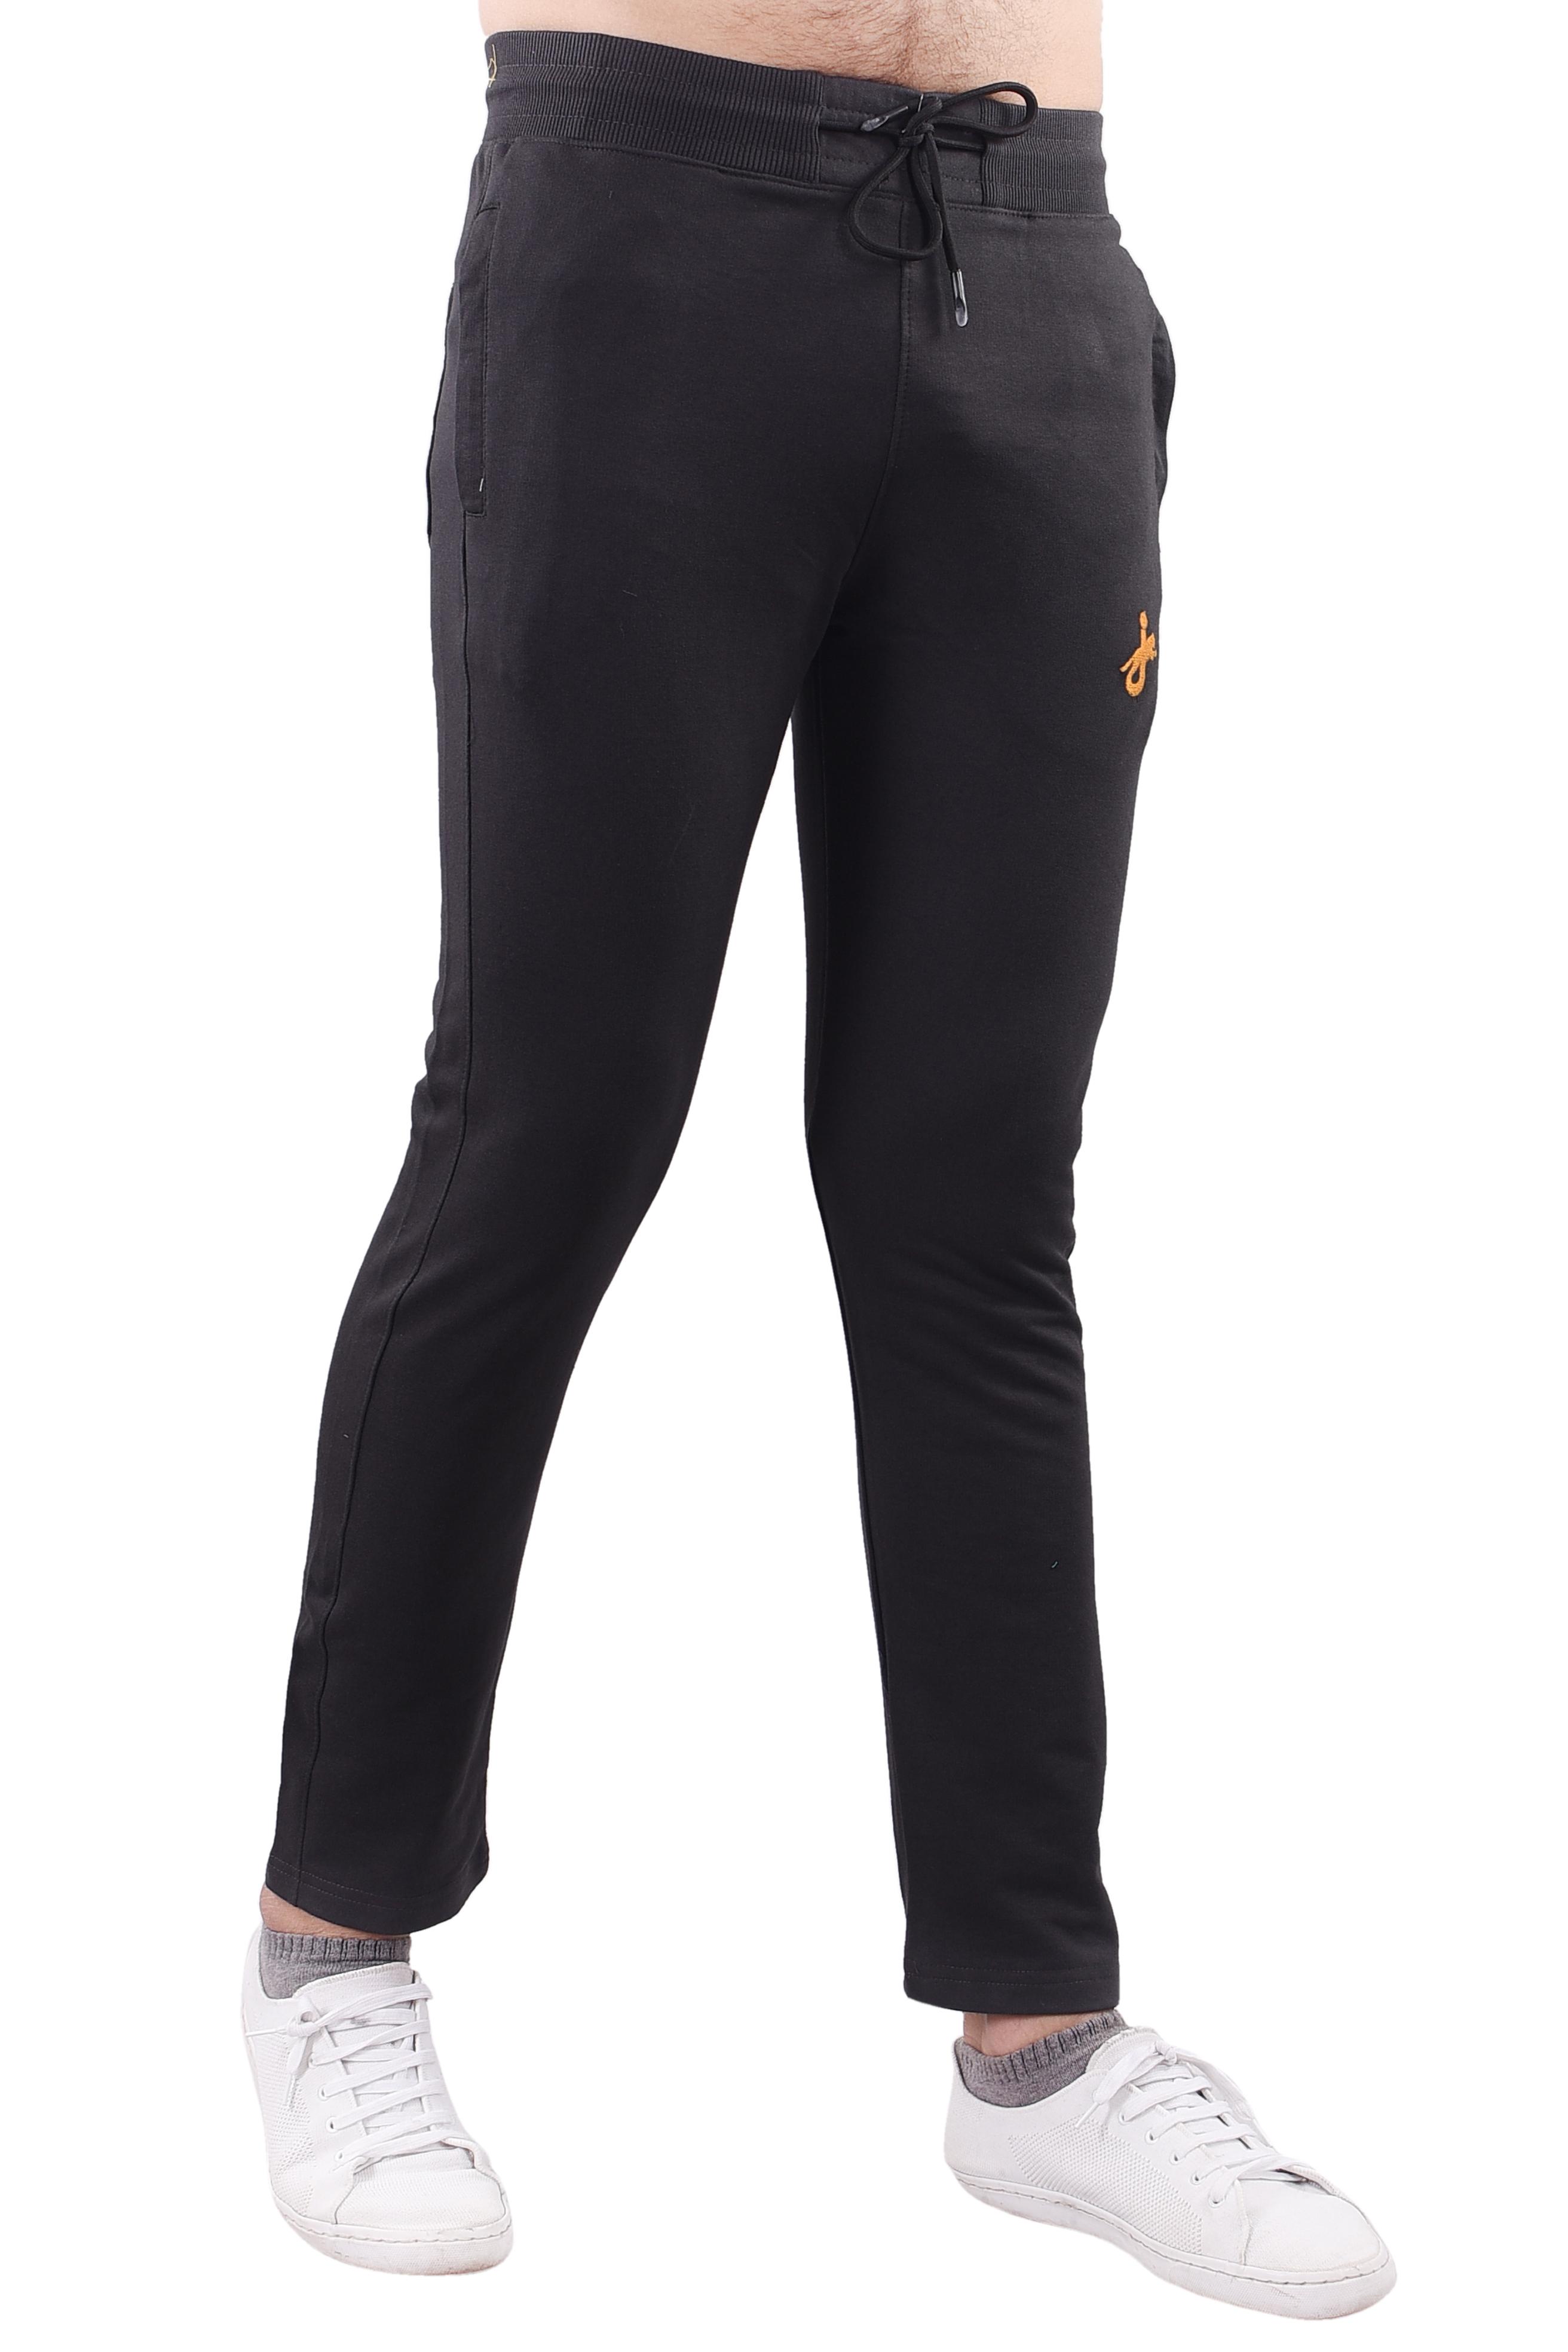 JAGURO | JAGURO Men's Cotton Solid Black Casual Track-Pant.